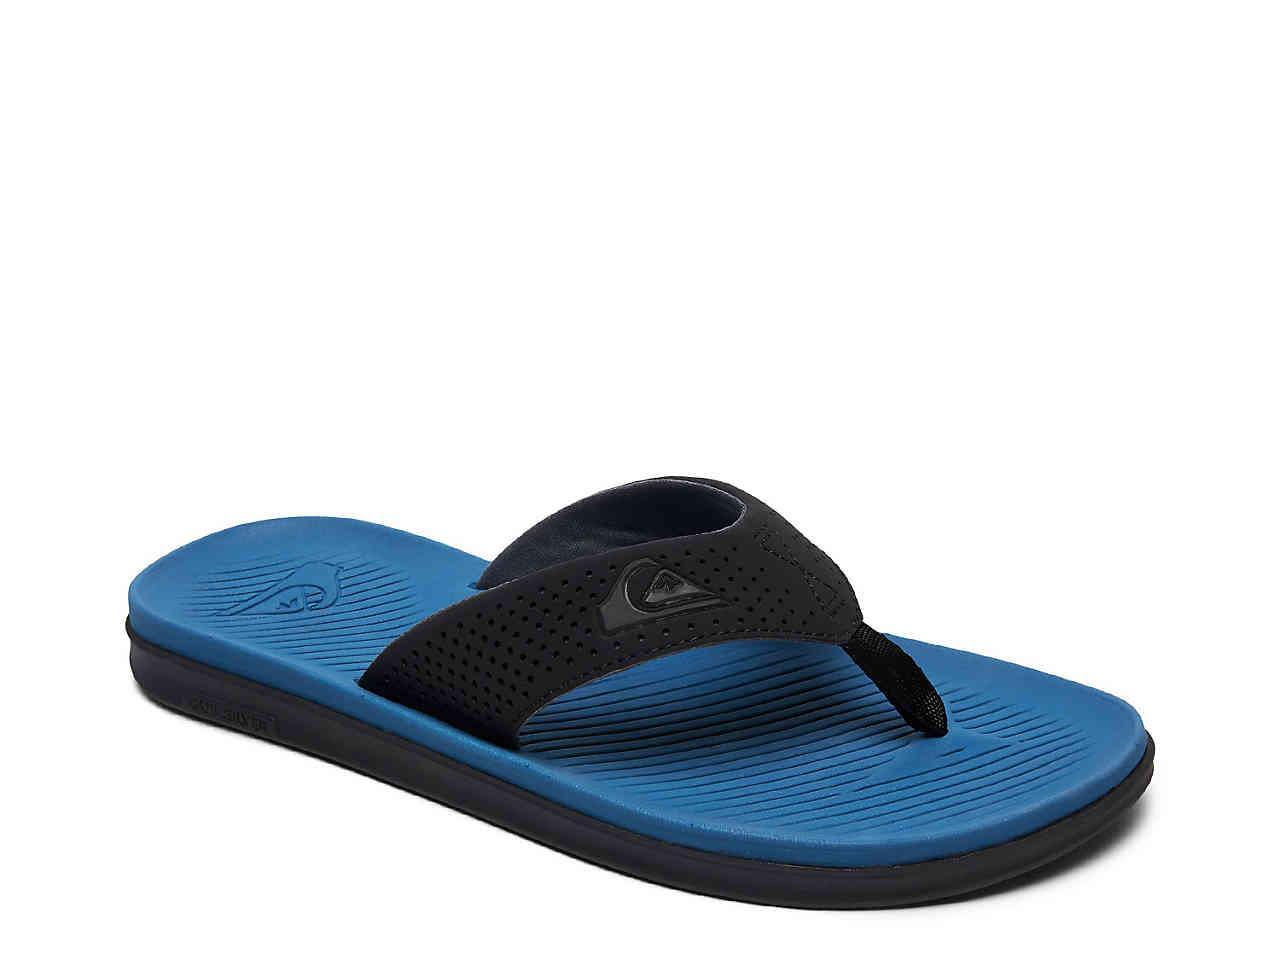 b40f31b85fa Lyst - Quiksilver Sandals in Blue for Men